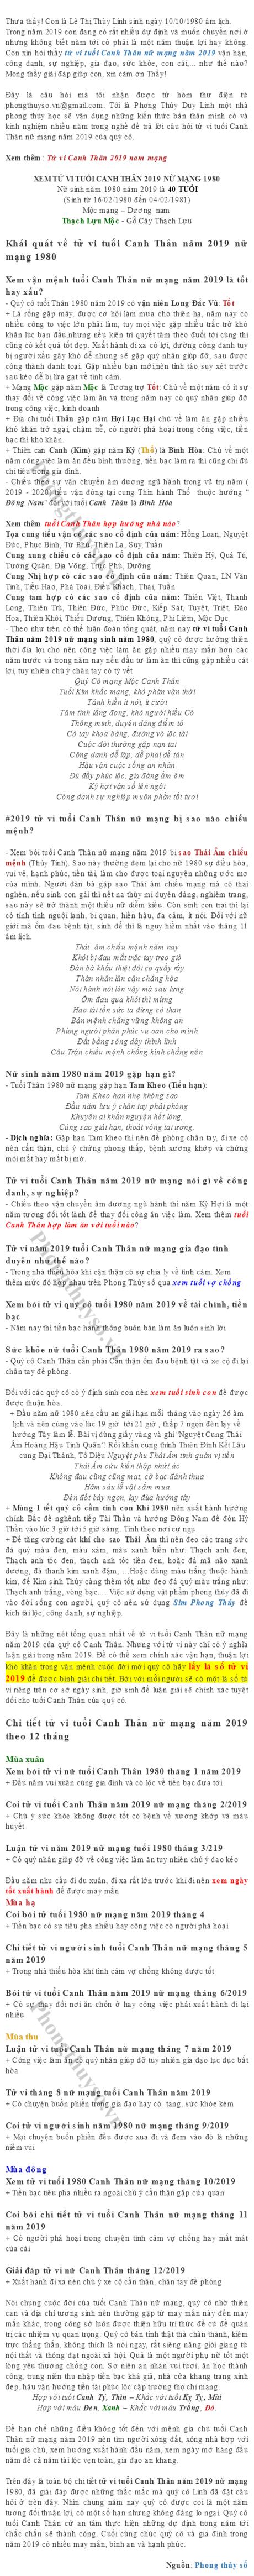 tu-vi-tuoi-canh-than-nam-2019-nu-mang